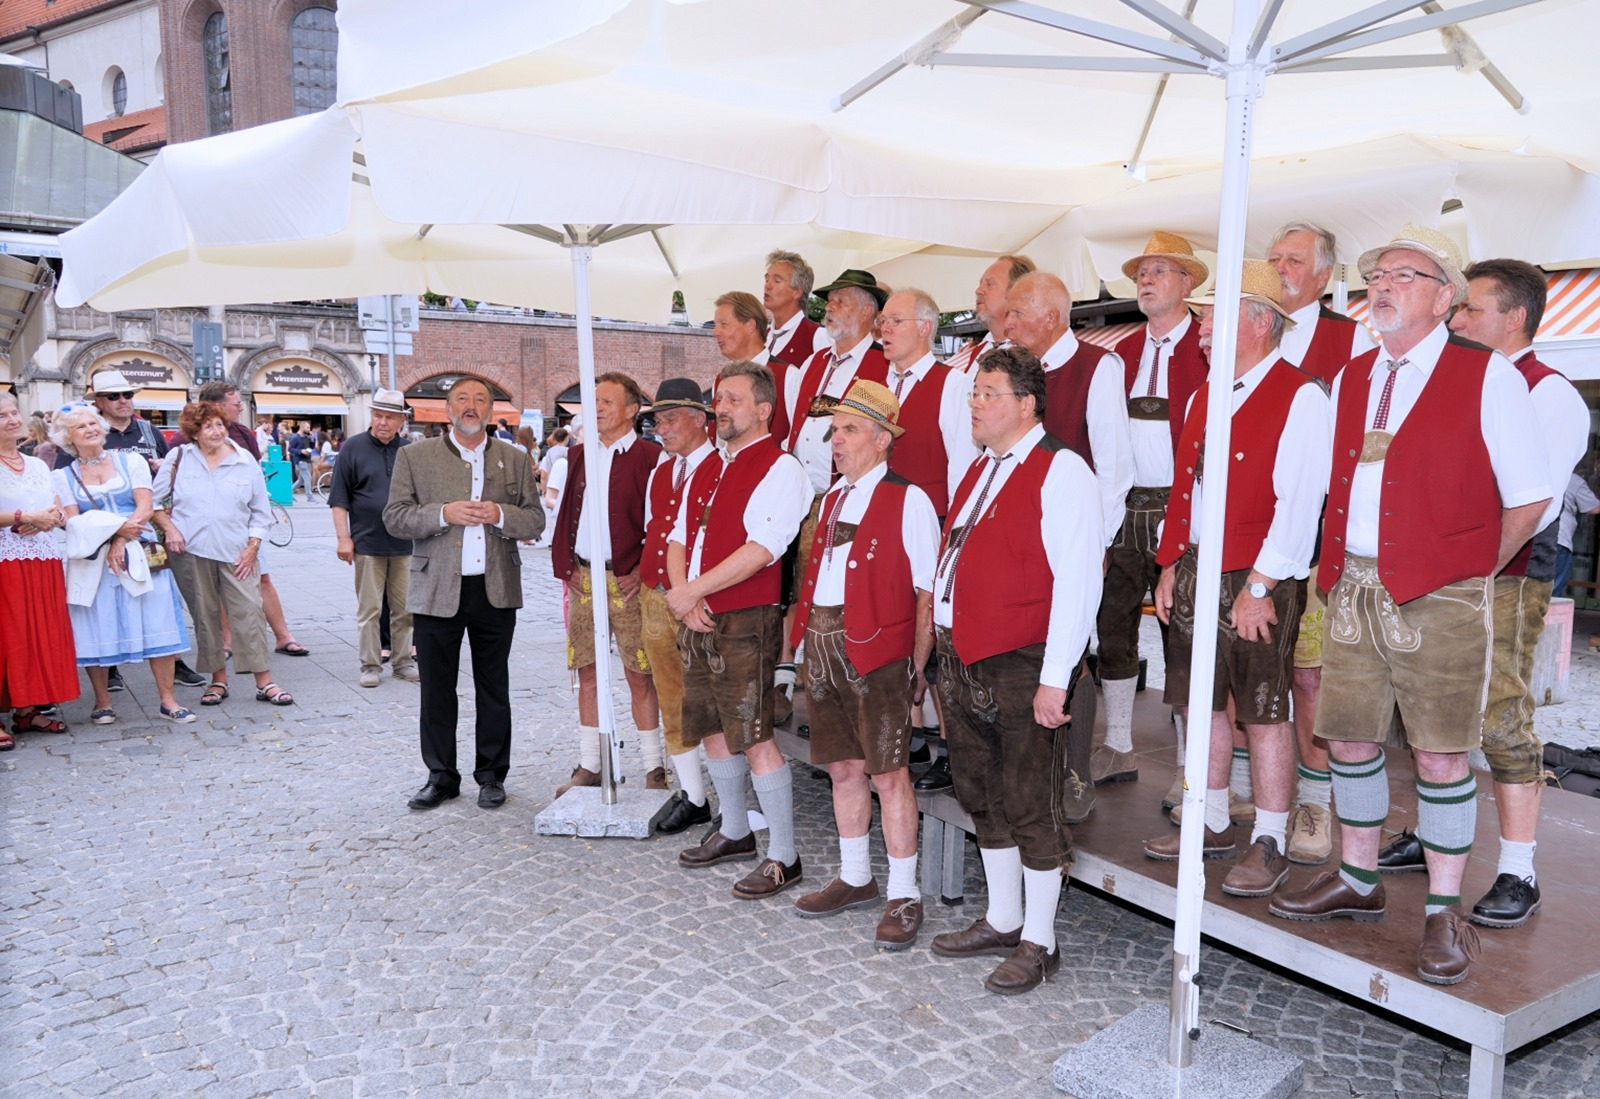 Sängerkreis Ottobrunn